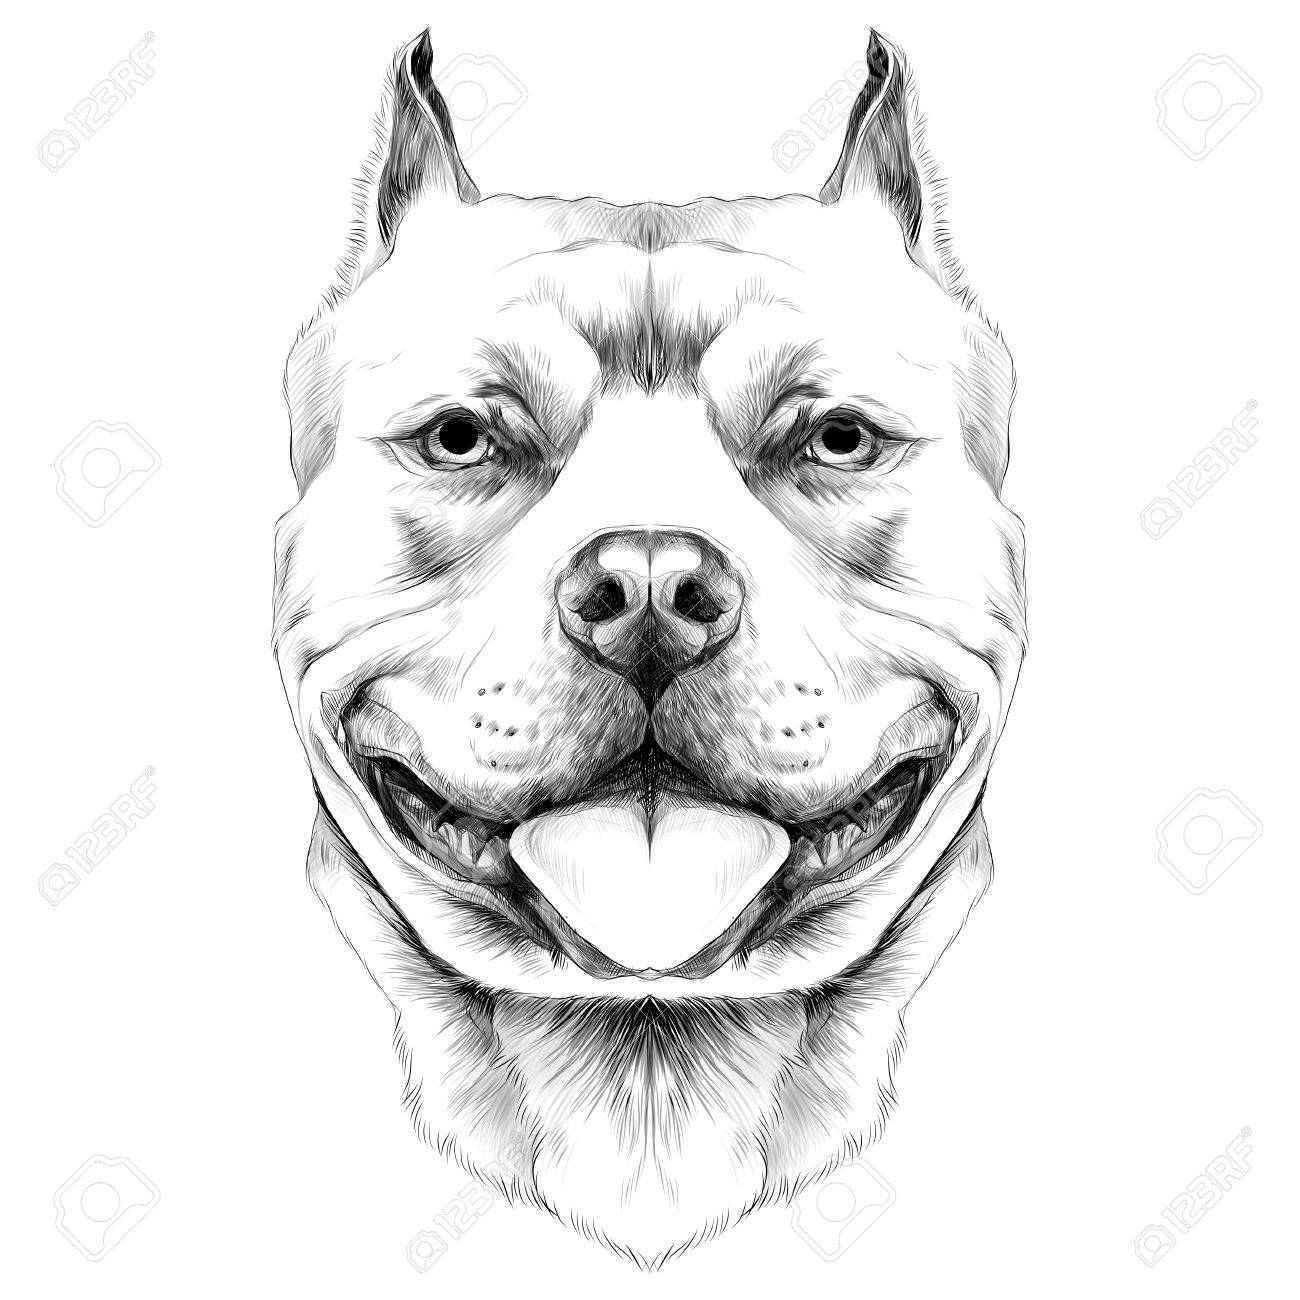 Perro Razas Americano Pitbull Terrier Cabeza Boceto Vector